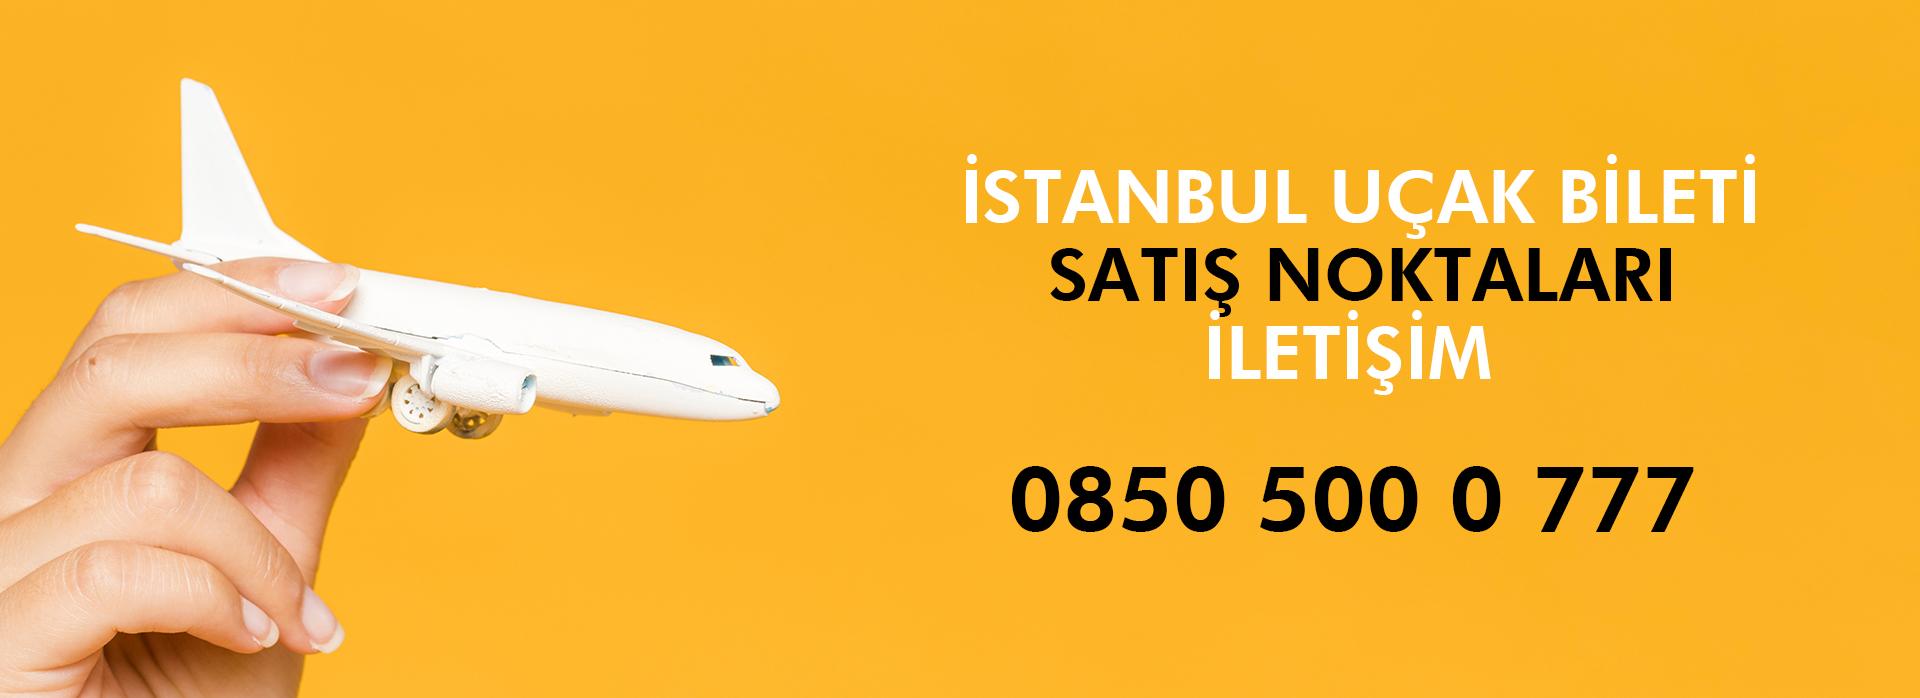 pegasus istanbul telefon numarası